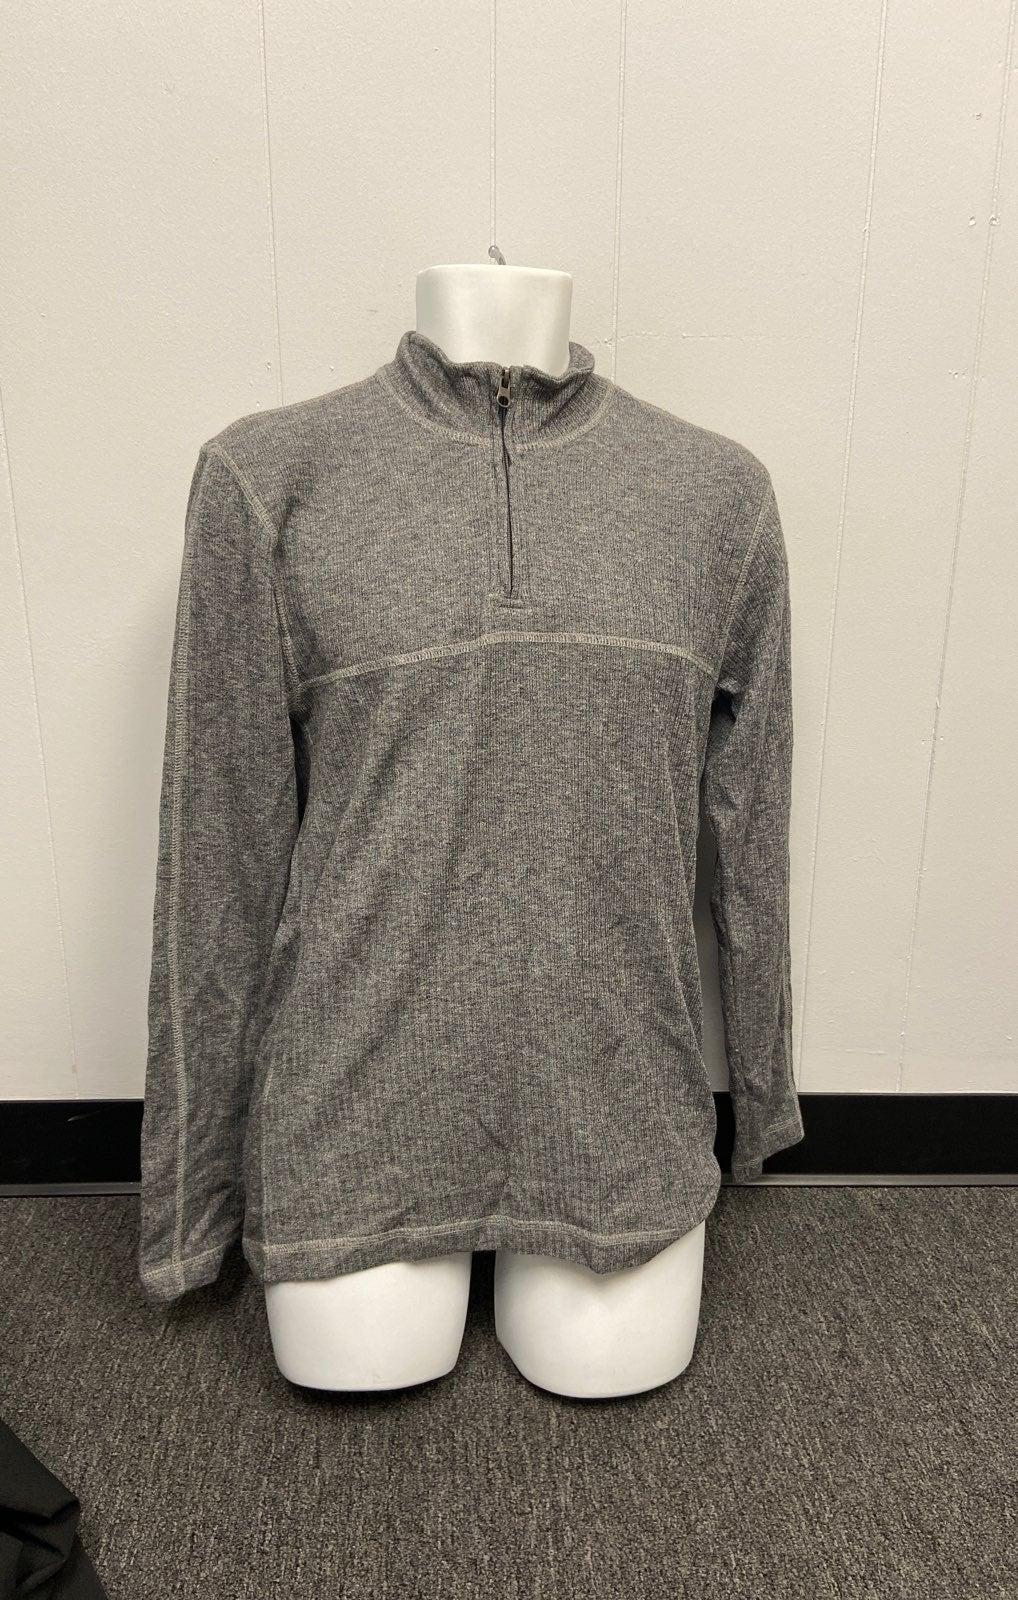 Men's Zip-up Long sleeve shirt size s